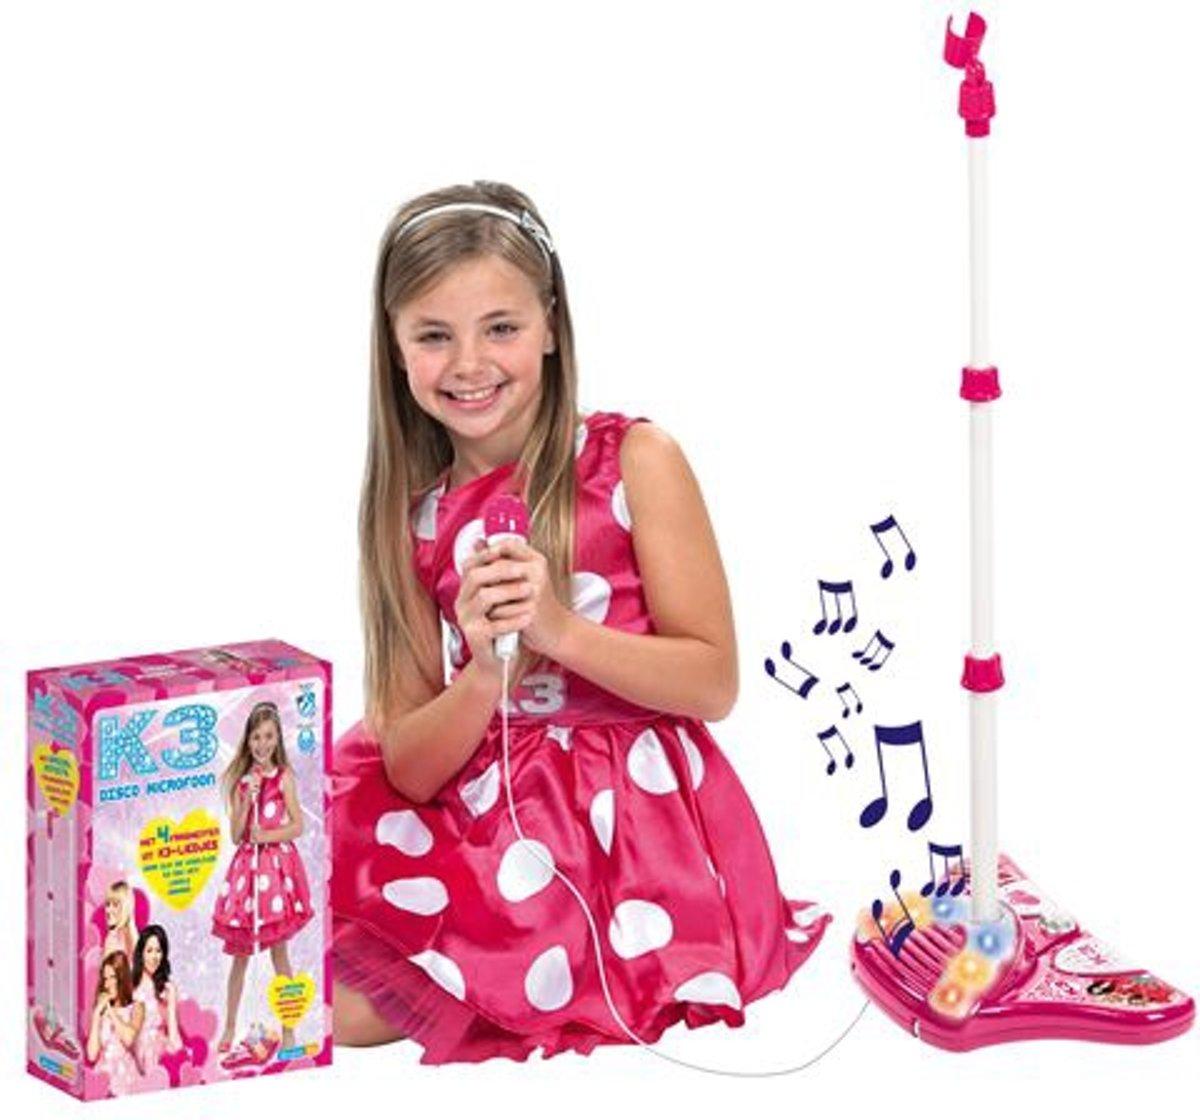 origineel cadeau meisje 4 jaar